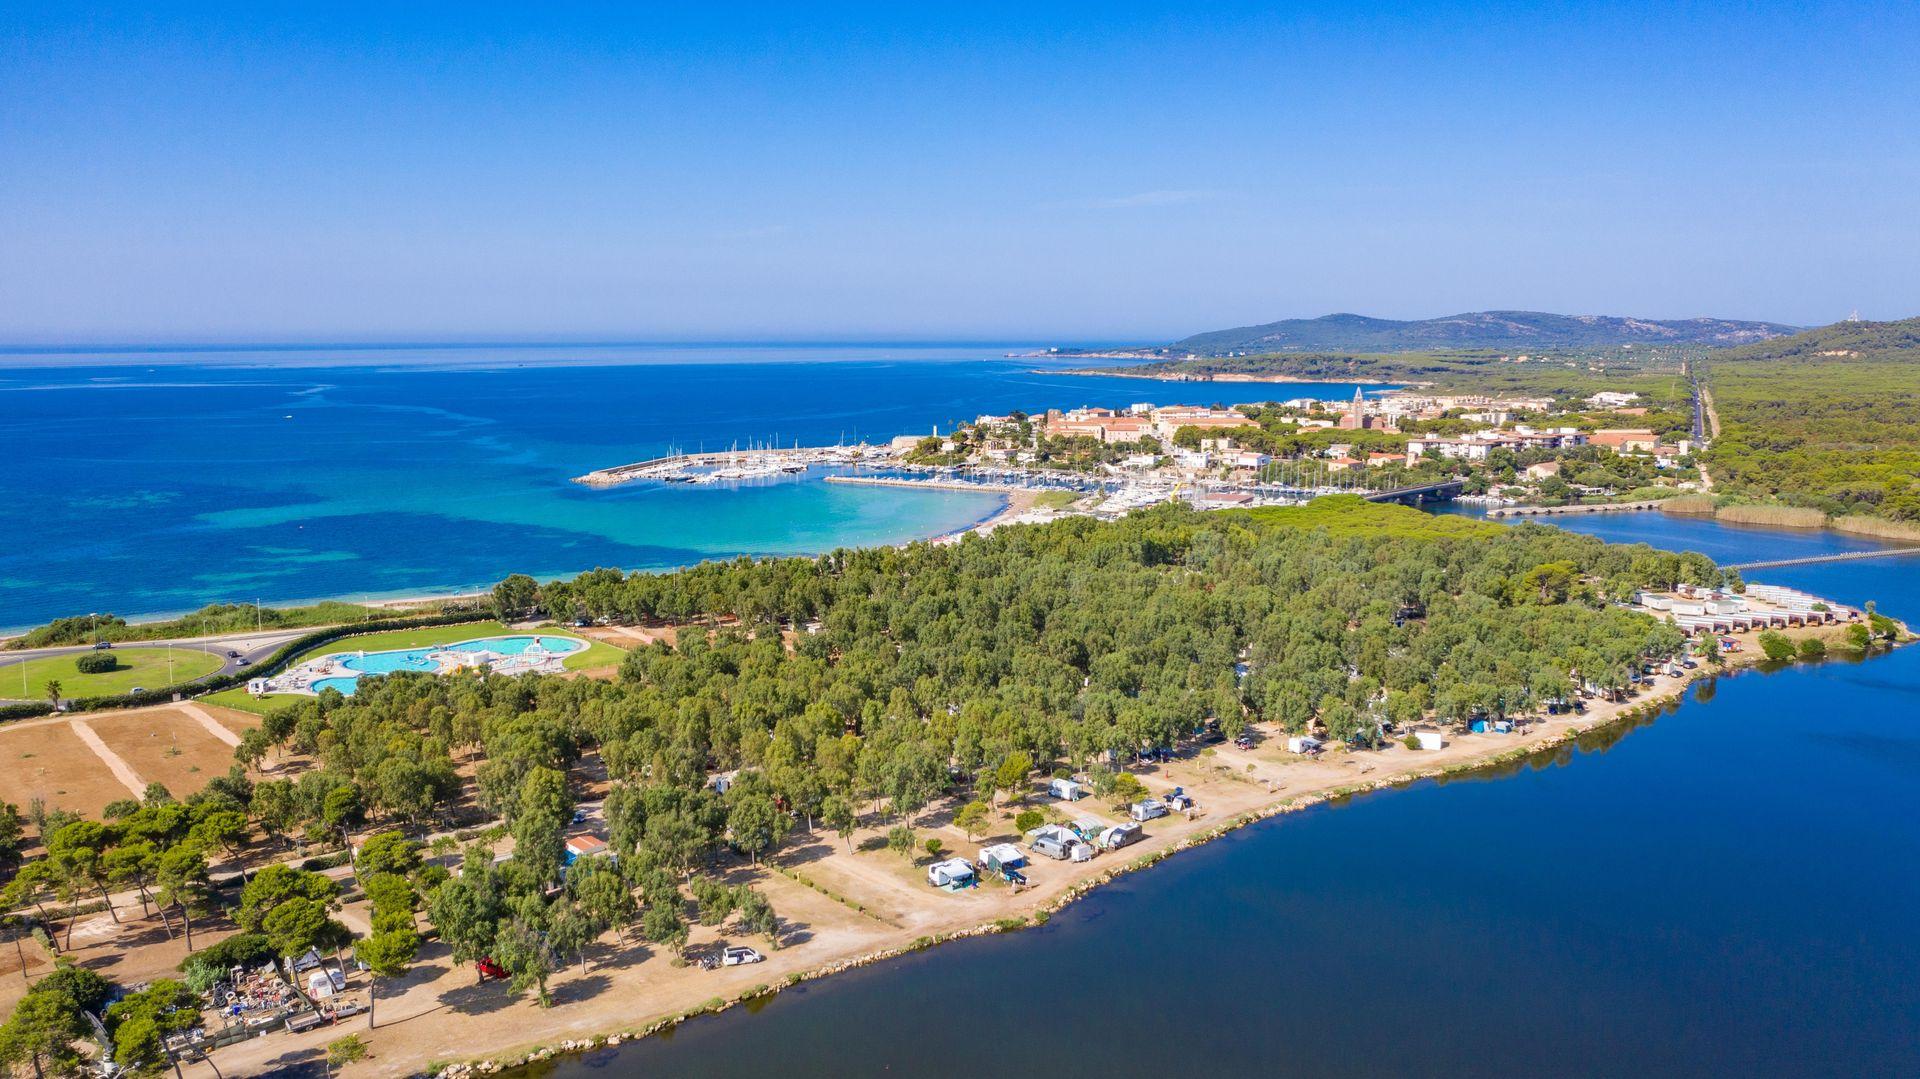 Full Board Holiday in Italy & Croatia